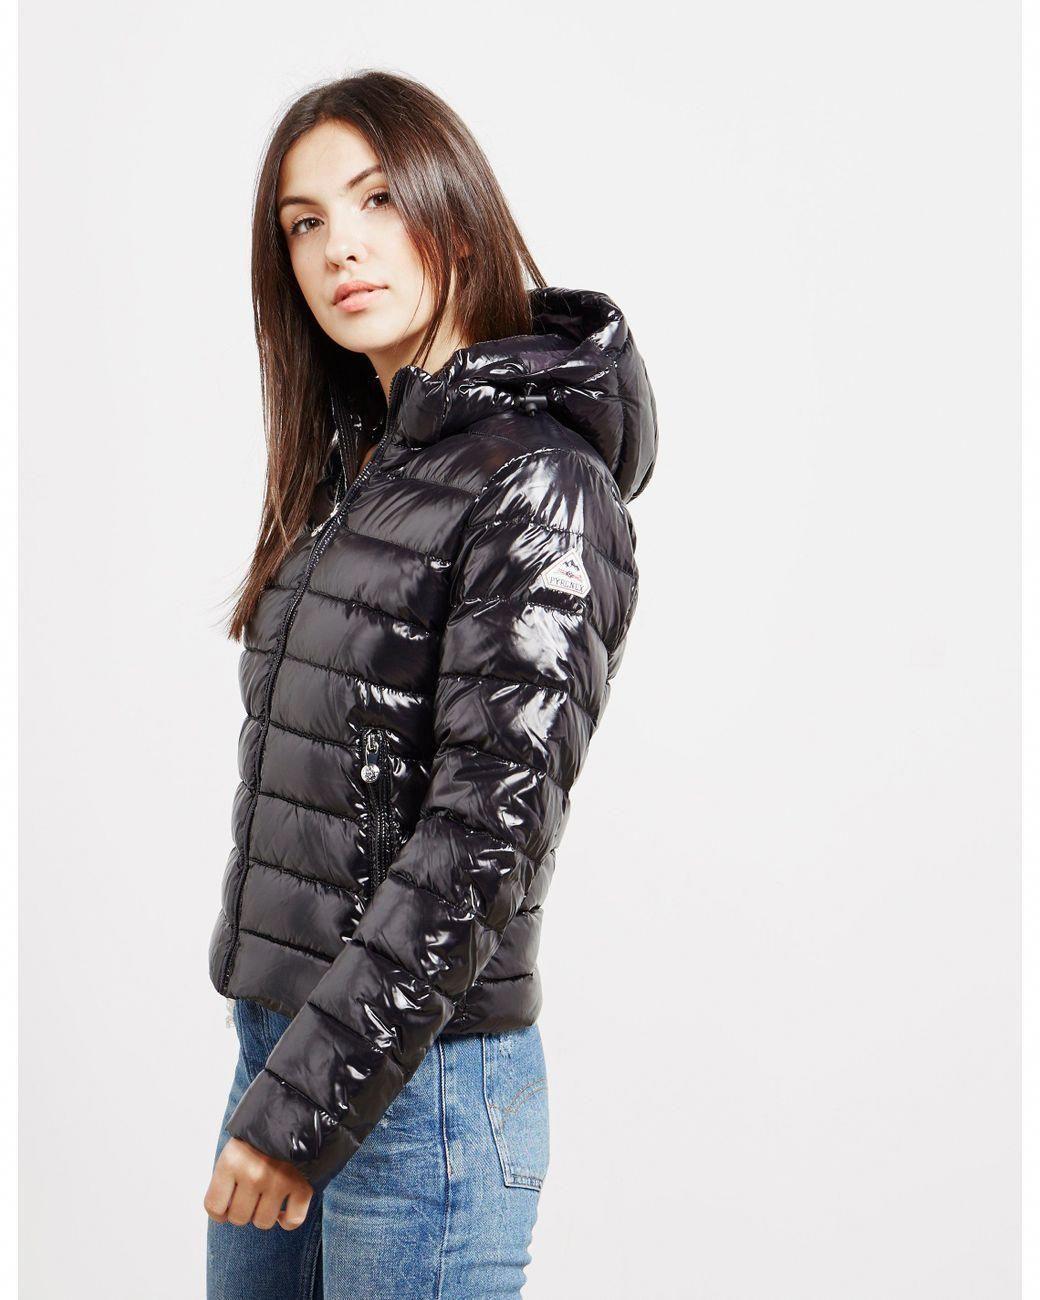 Pyrenex Womens Spoutnic Shiny Jacket Black Lyst